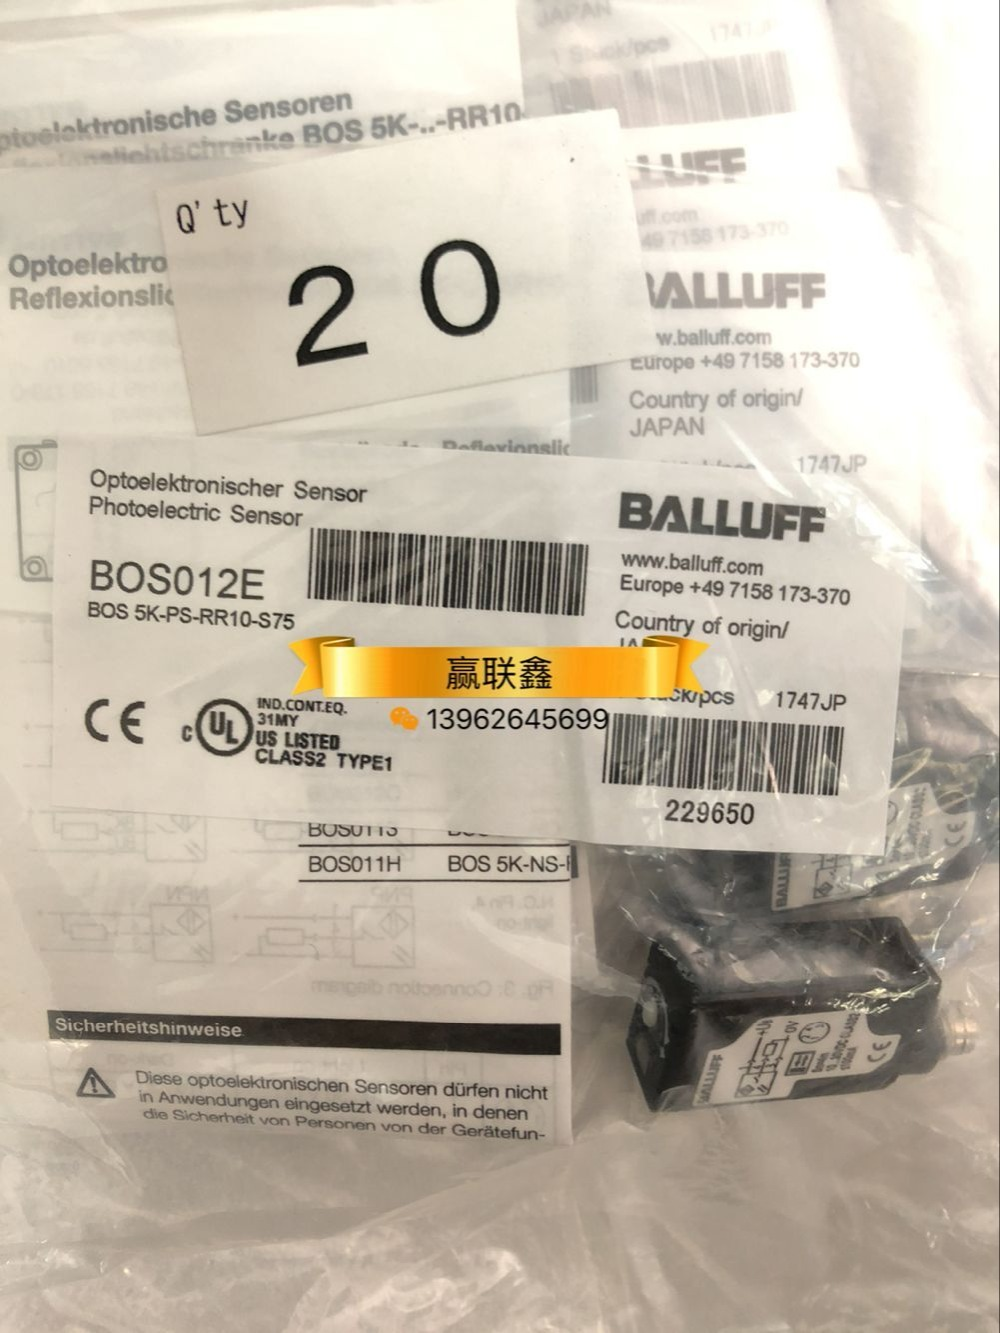 Lot of 10 Balluff Photoelectric Sensor BOS 12M-PO-1YA-BO-C